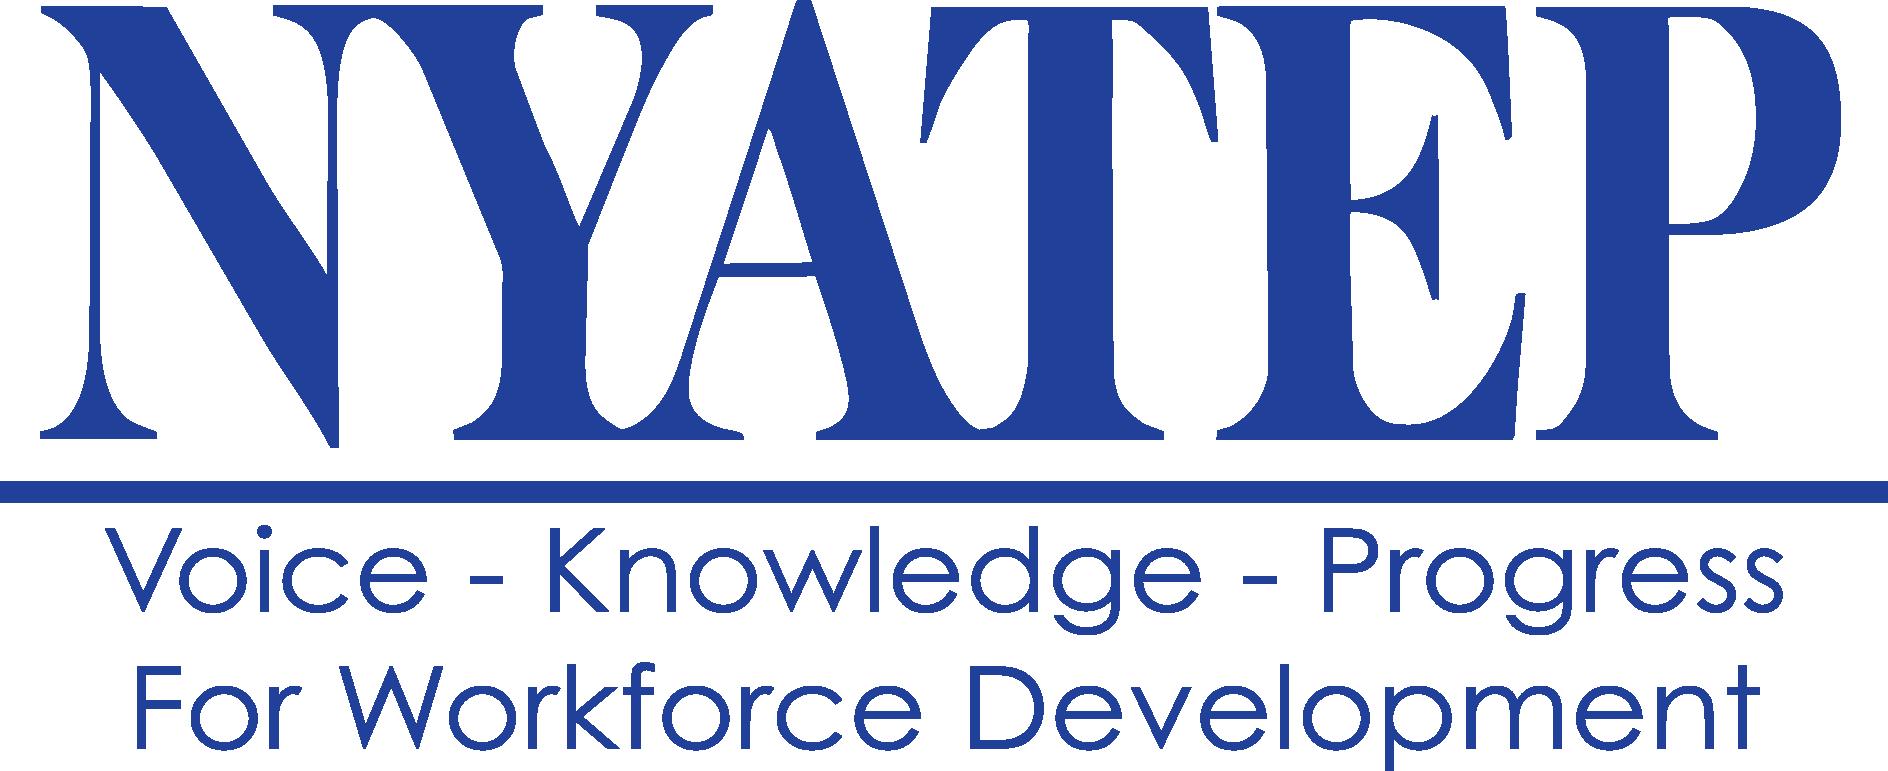 NYATEP vector logo.png